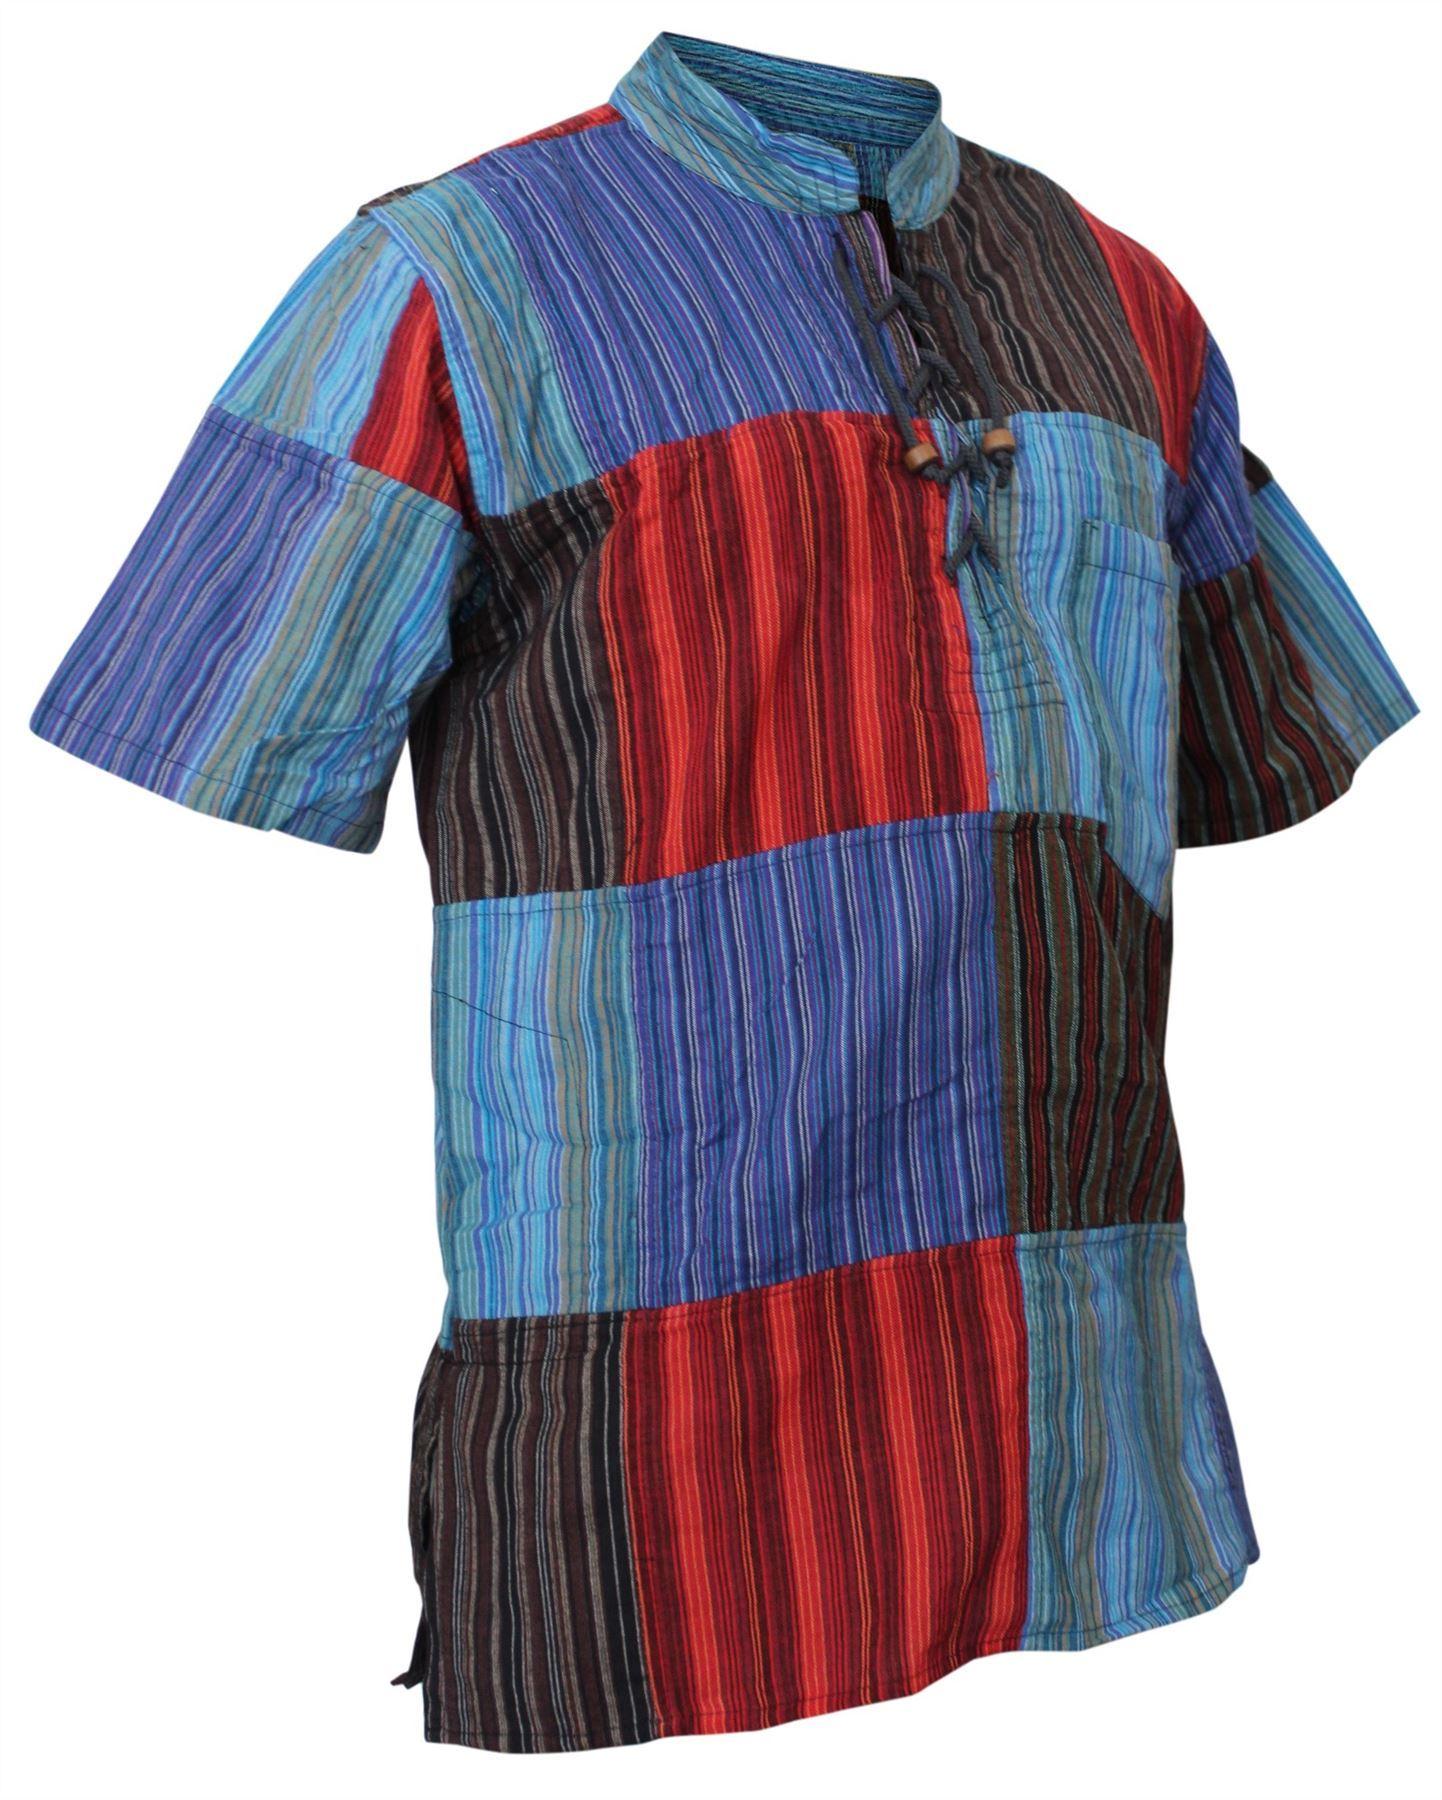 Mens-Short-Sleeved-Colorful-Hippie-Grandad-Shirt-Summer-Festival-Cotton-Men-Tops thumbnail 5